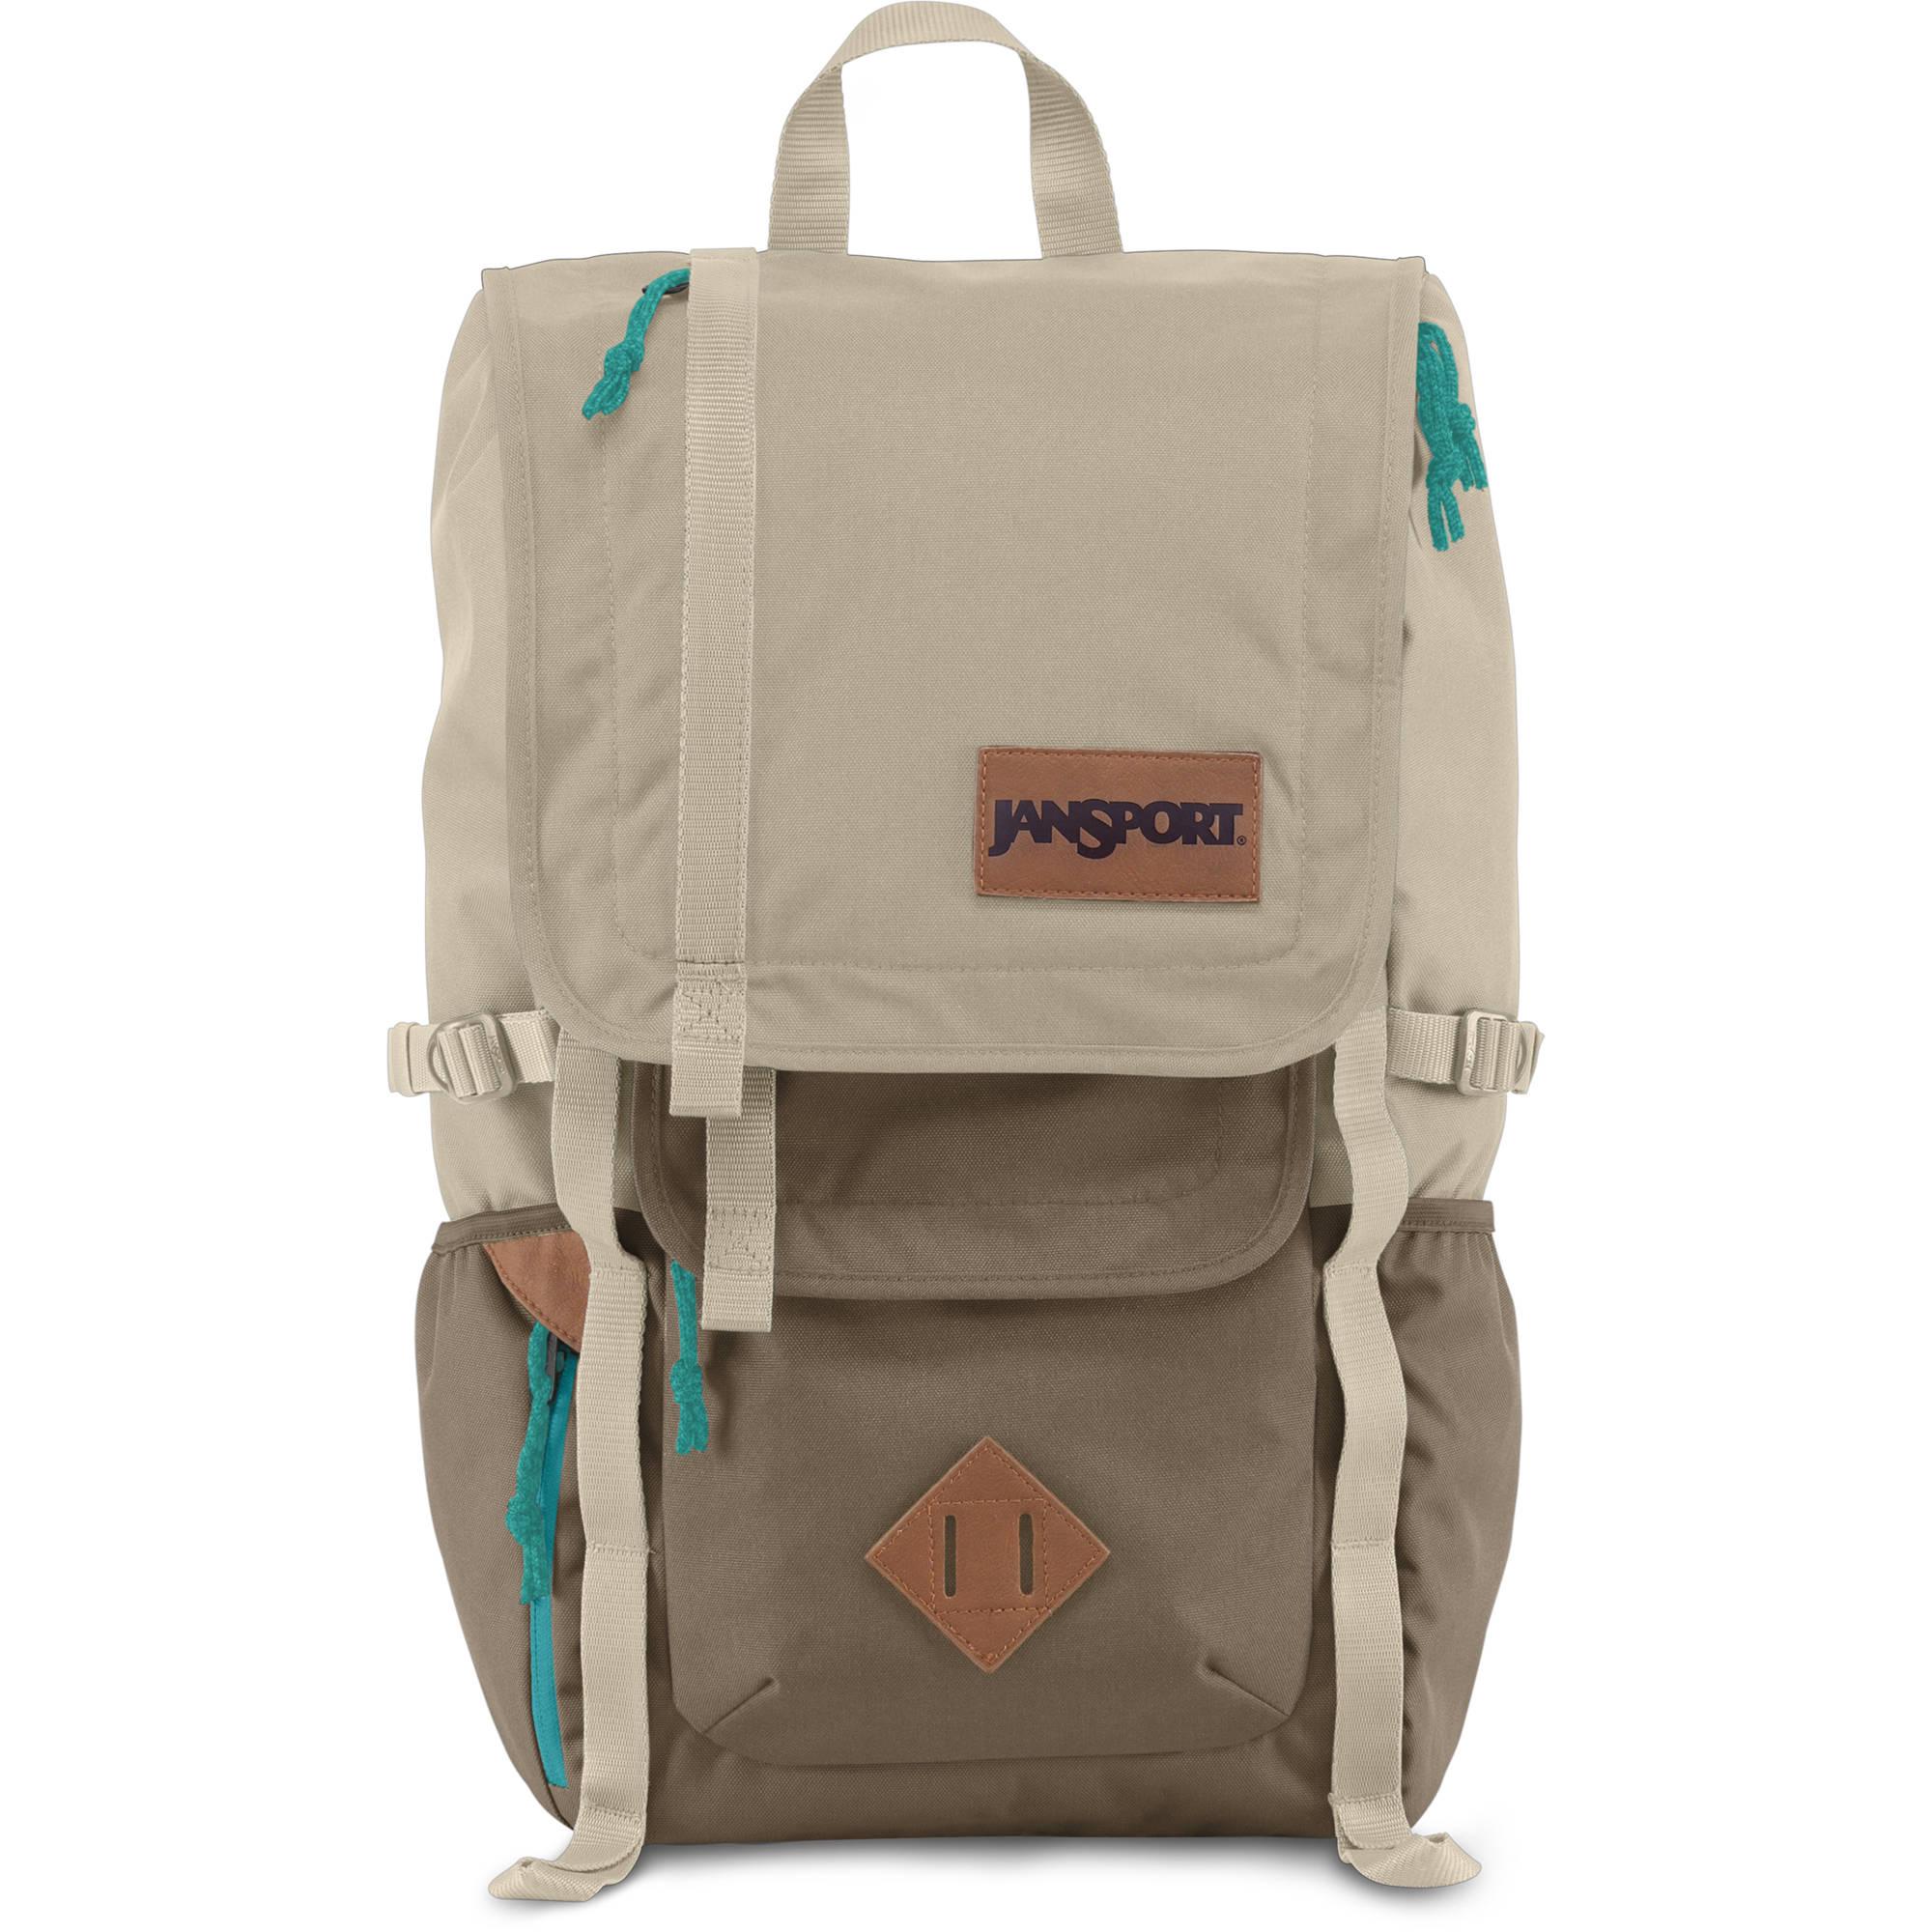 JanSport Hatchet 28L Backpack (Bozeman Brown) T52S9RV B&H Photo